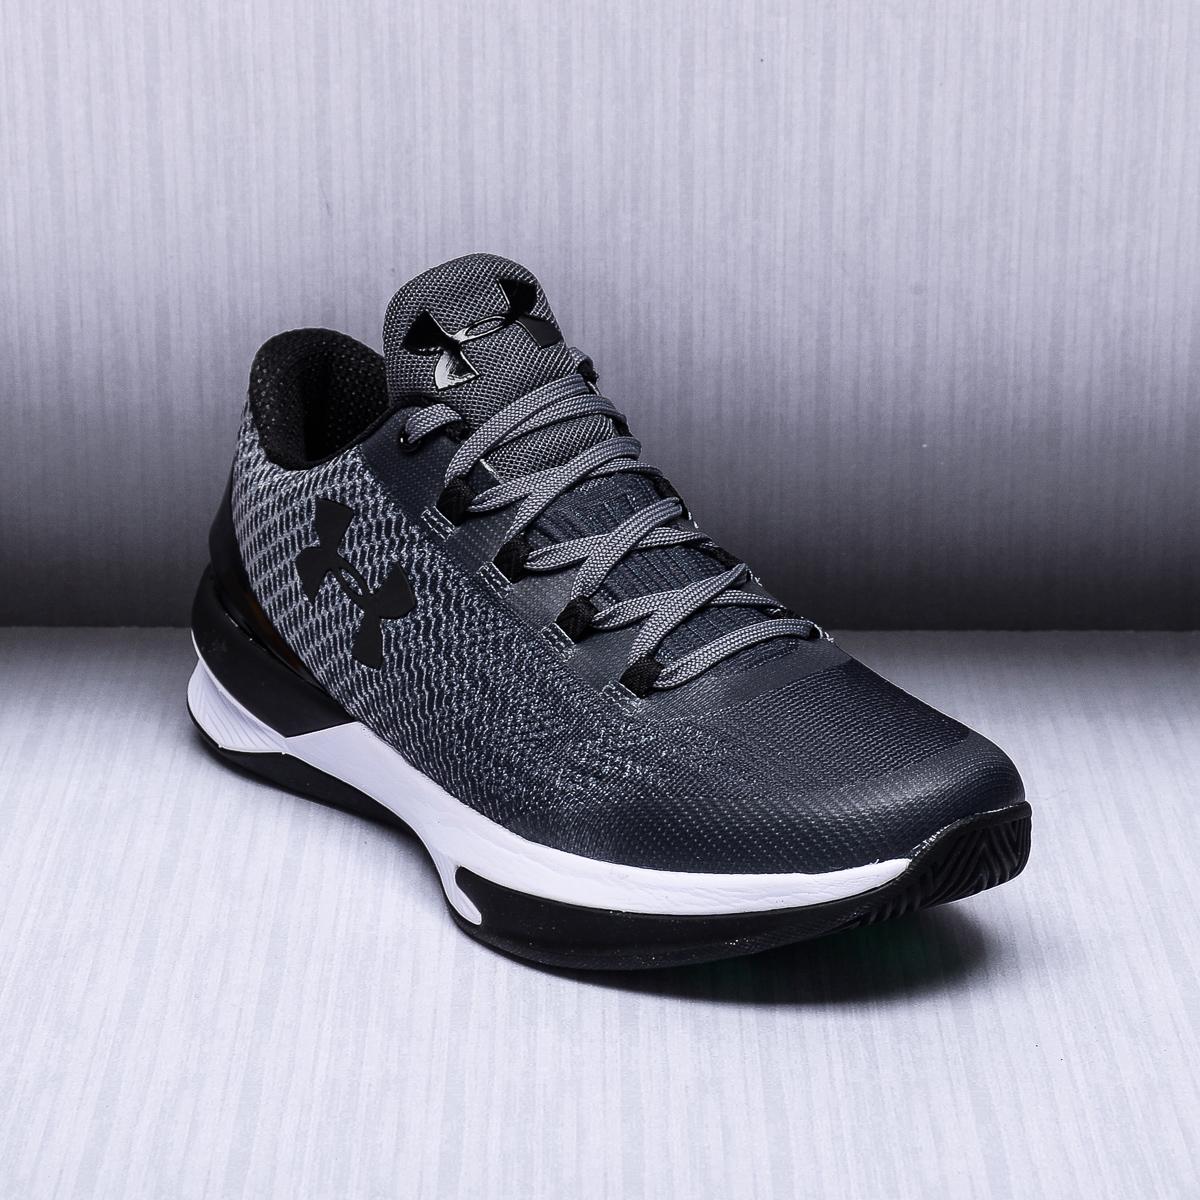 Basketball Shoes Use